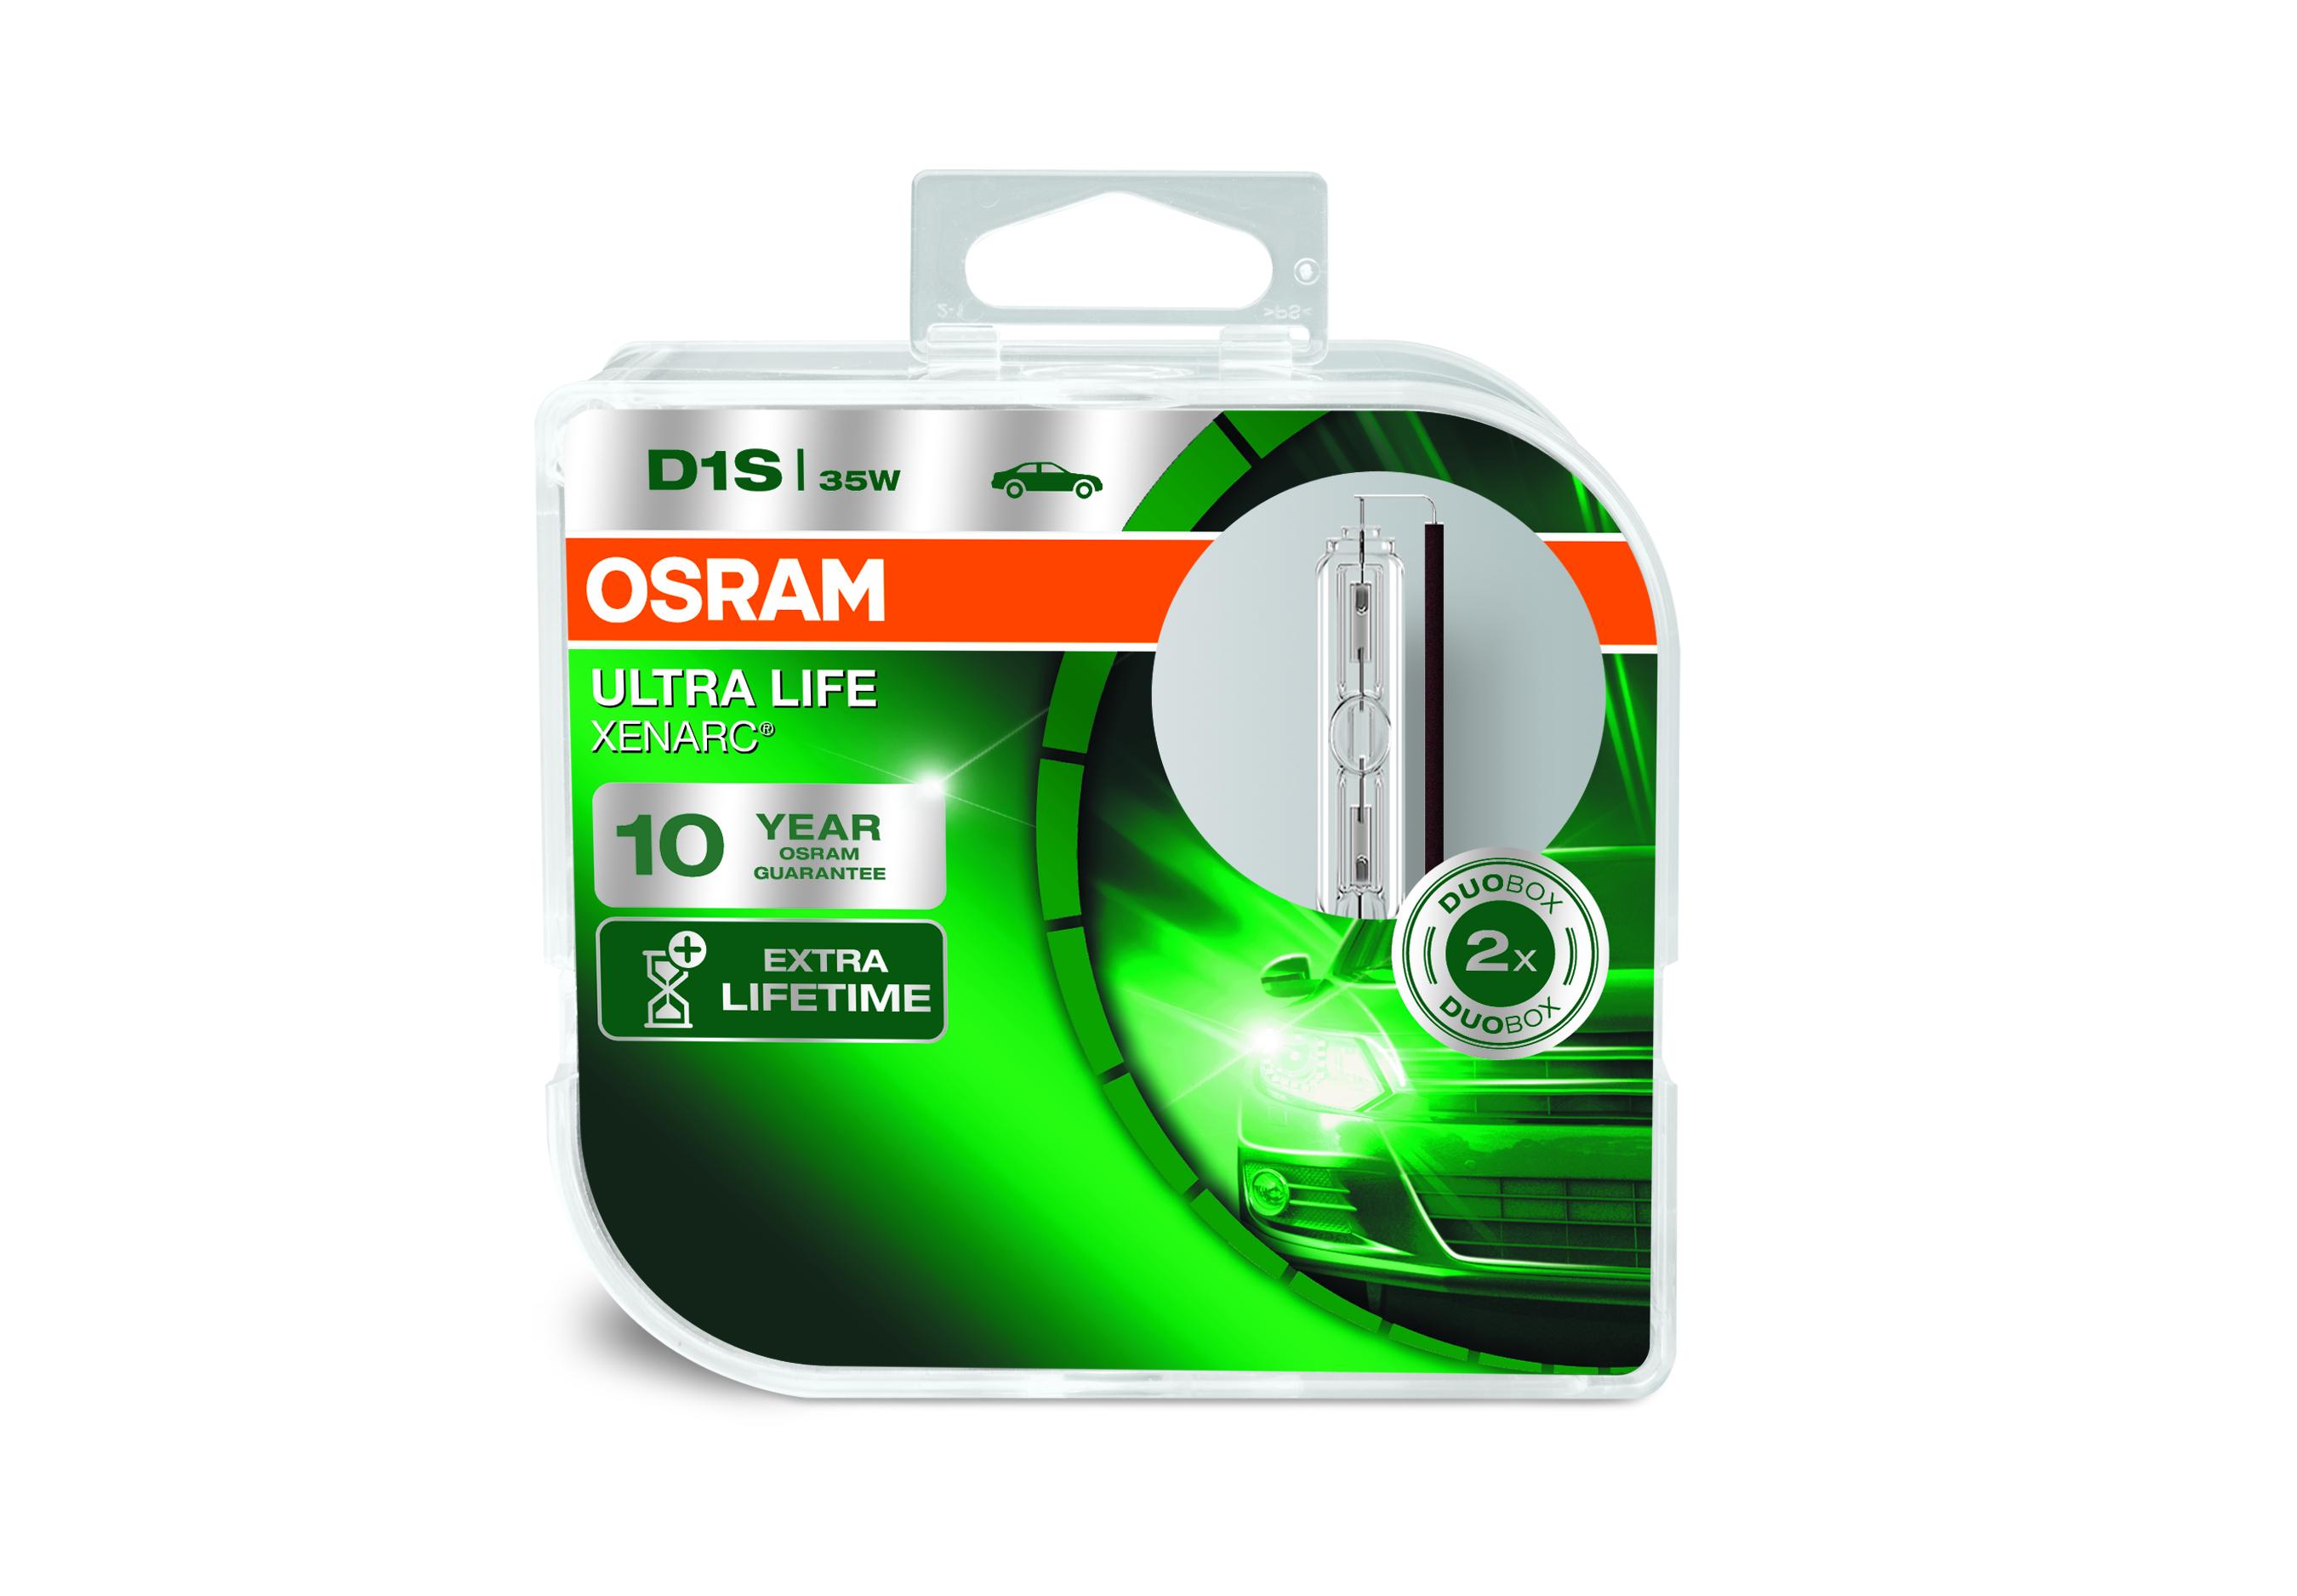 Osram Xenonová výbojka, XENARC ULTRALIFE, D1S, PK32d-2, 12/24V, 35W, 66140ULT-HCB